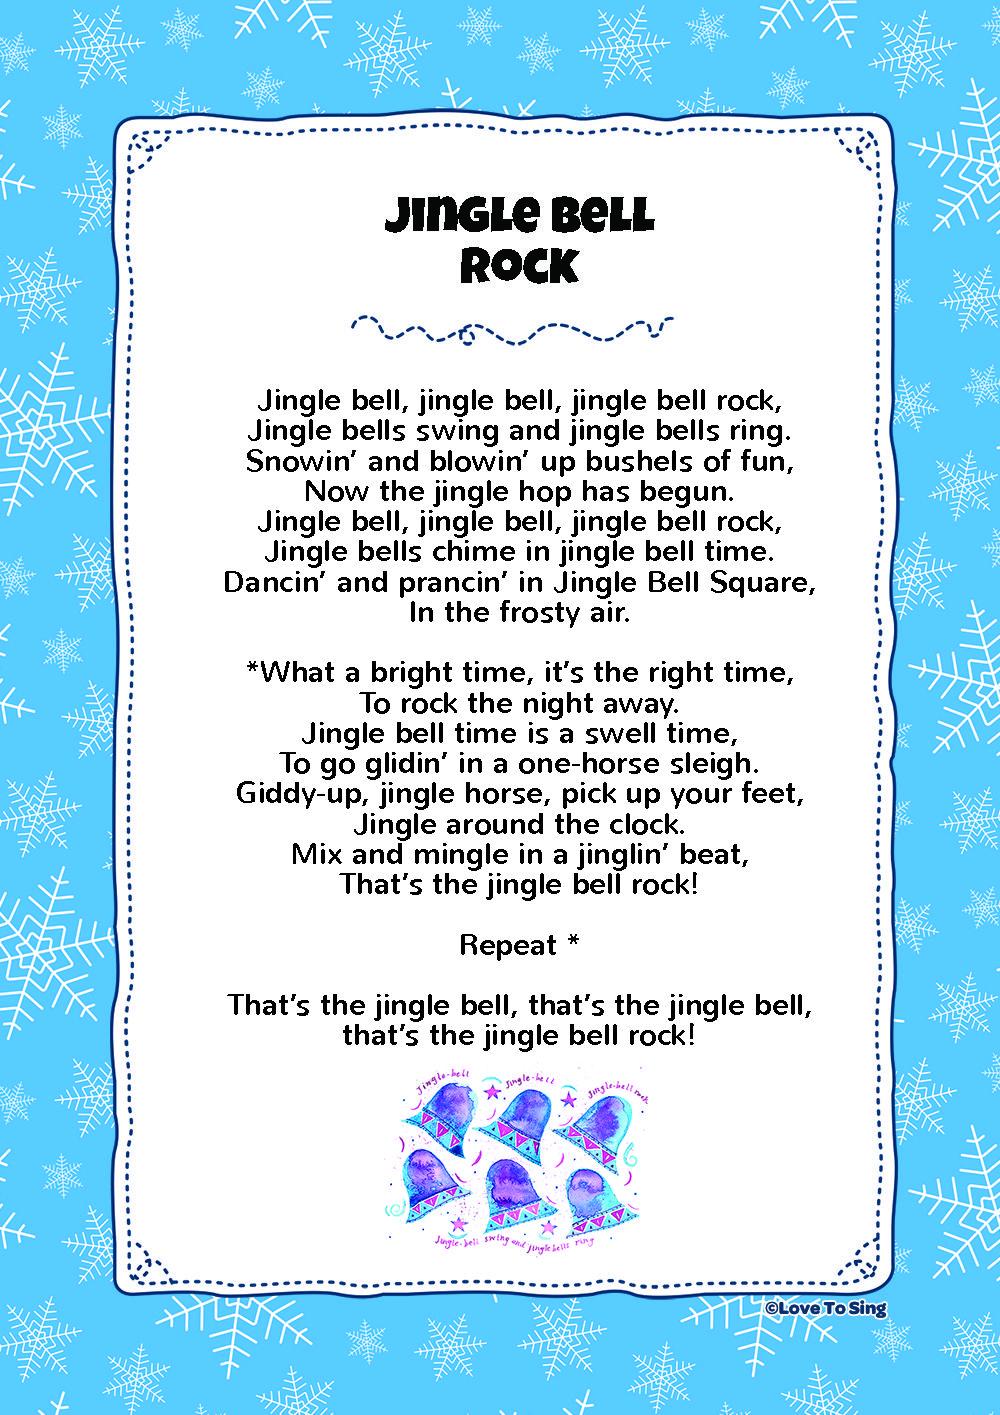 Jingle Bell Rock   Christmas songs for kids, Christmas songs lyrics, Kids video songs